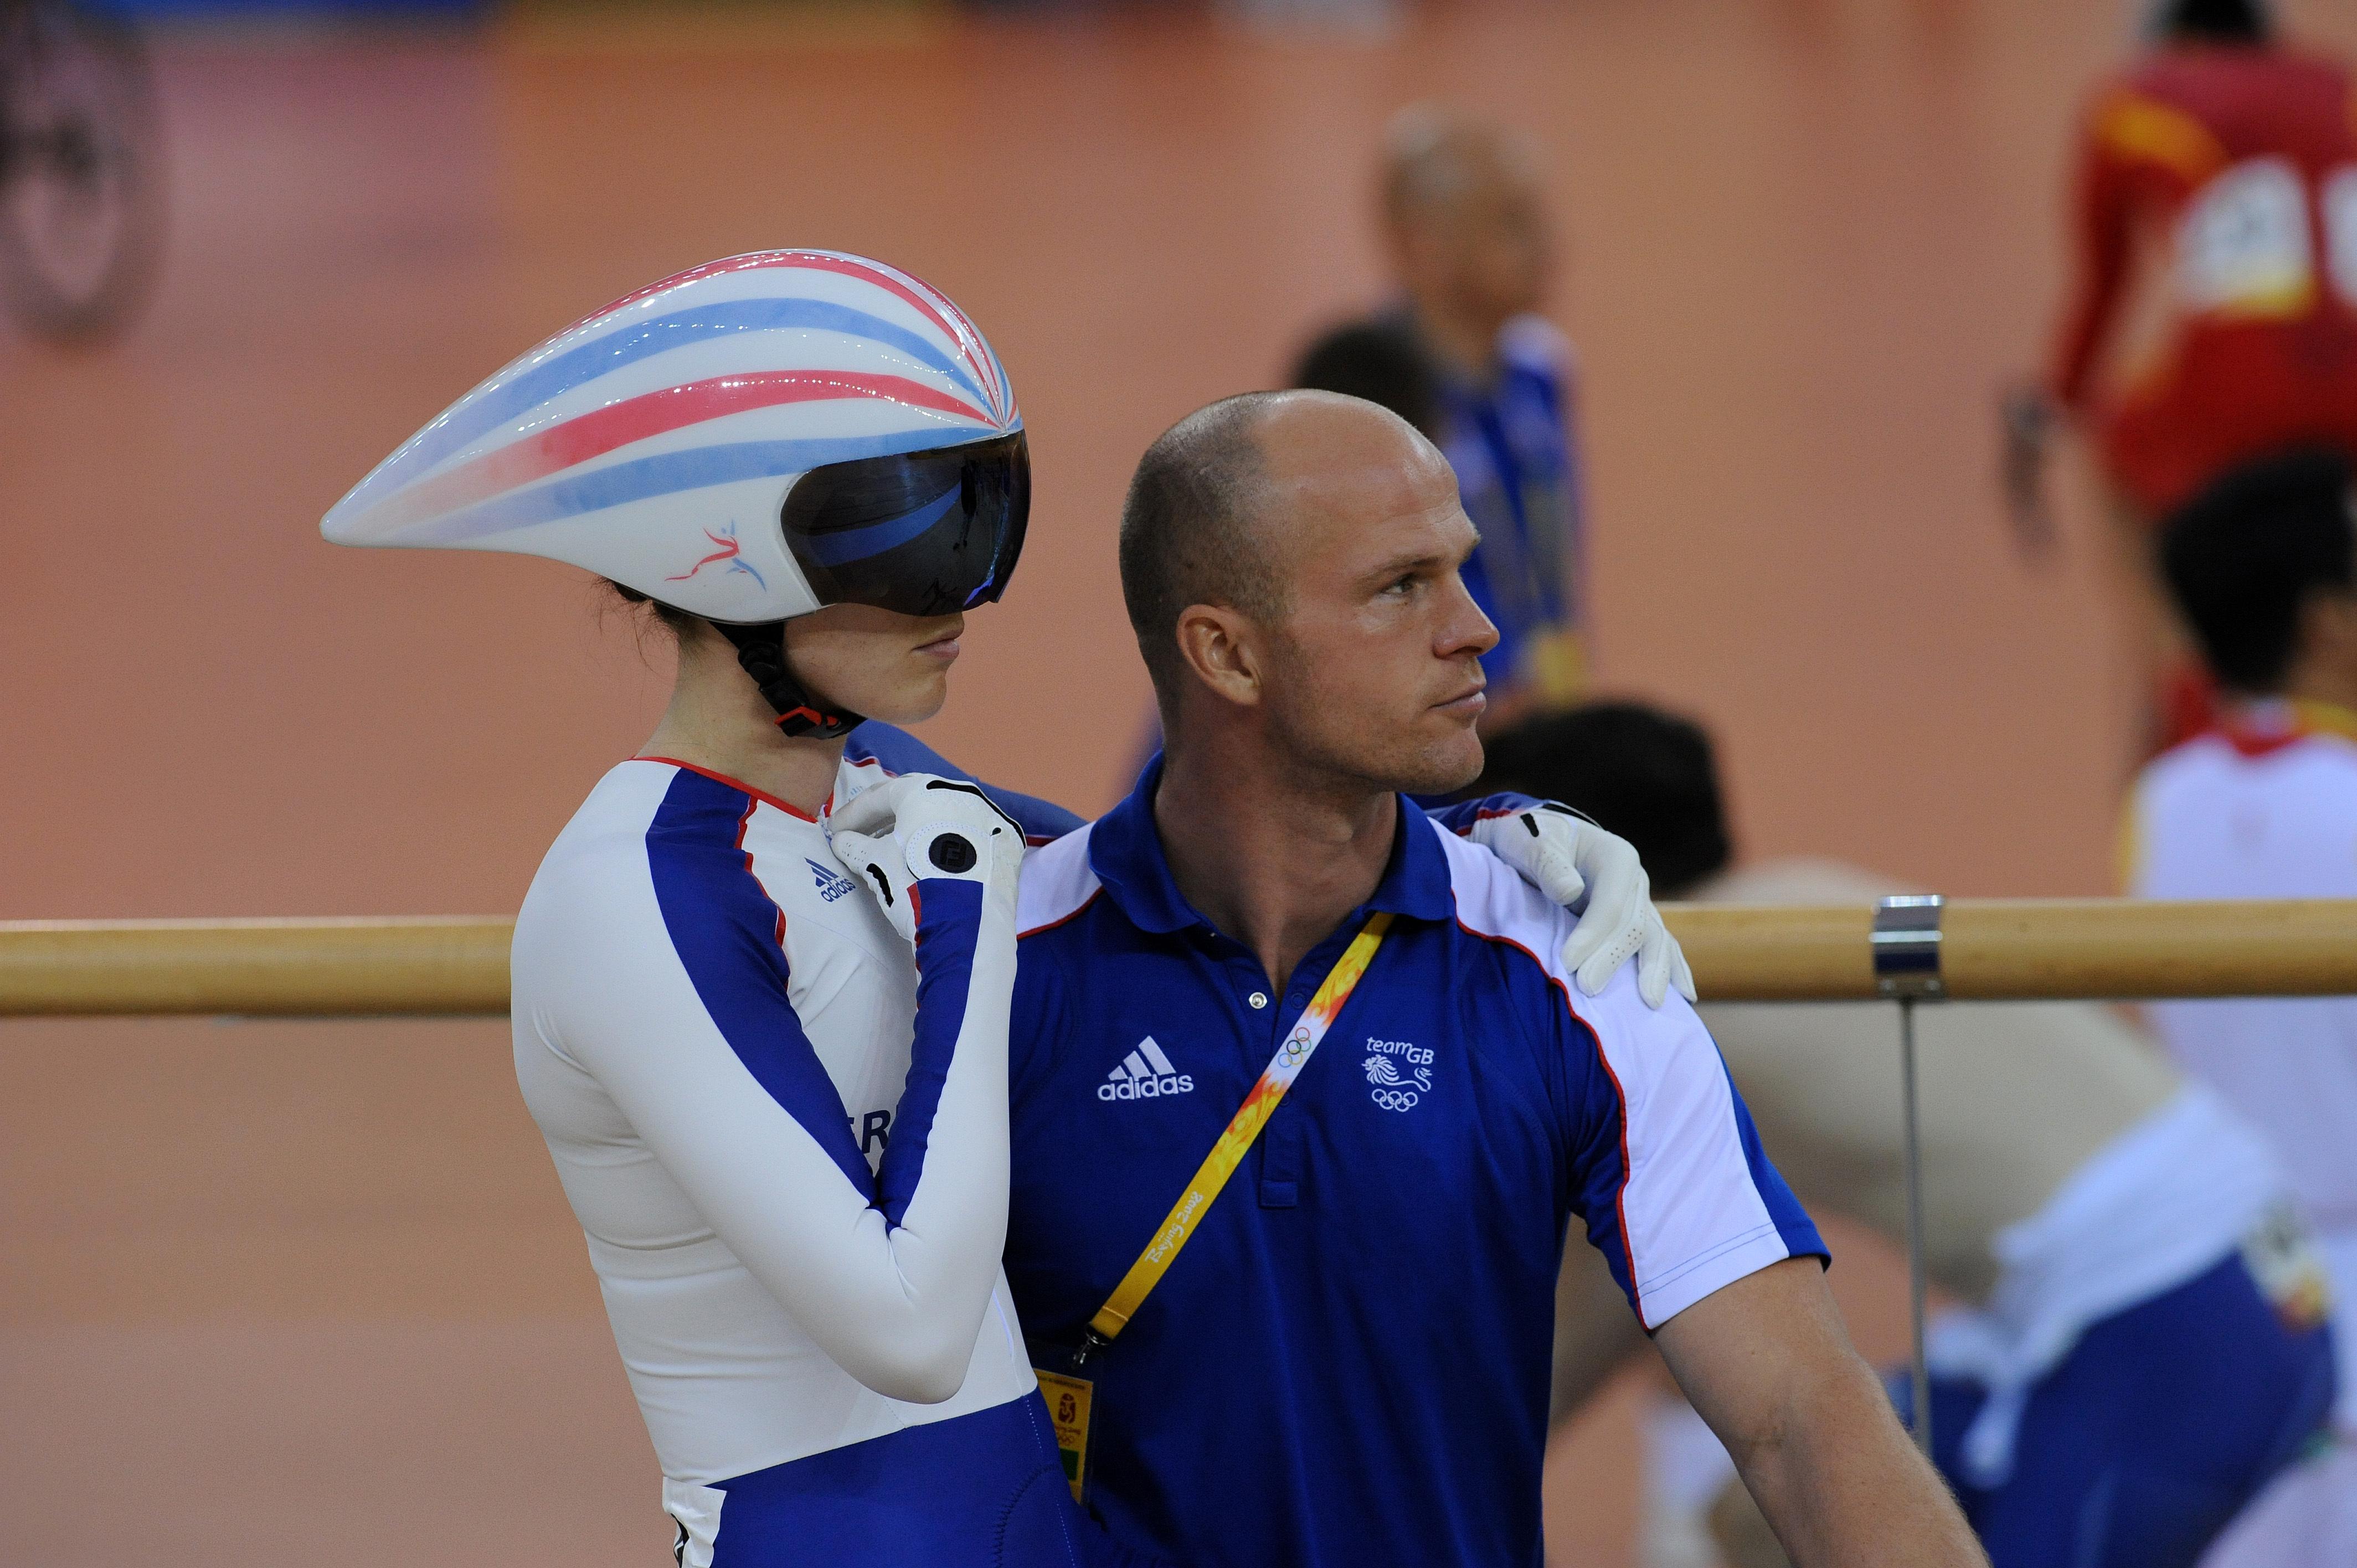 Victoria Pendleton sprint Olympics 2008